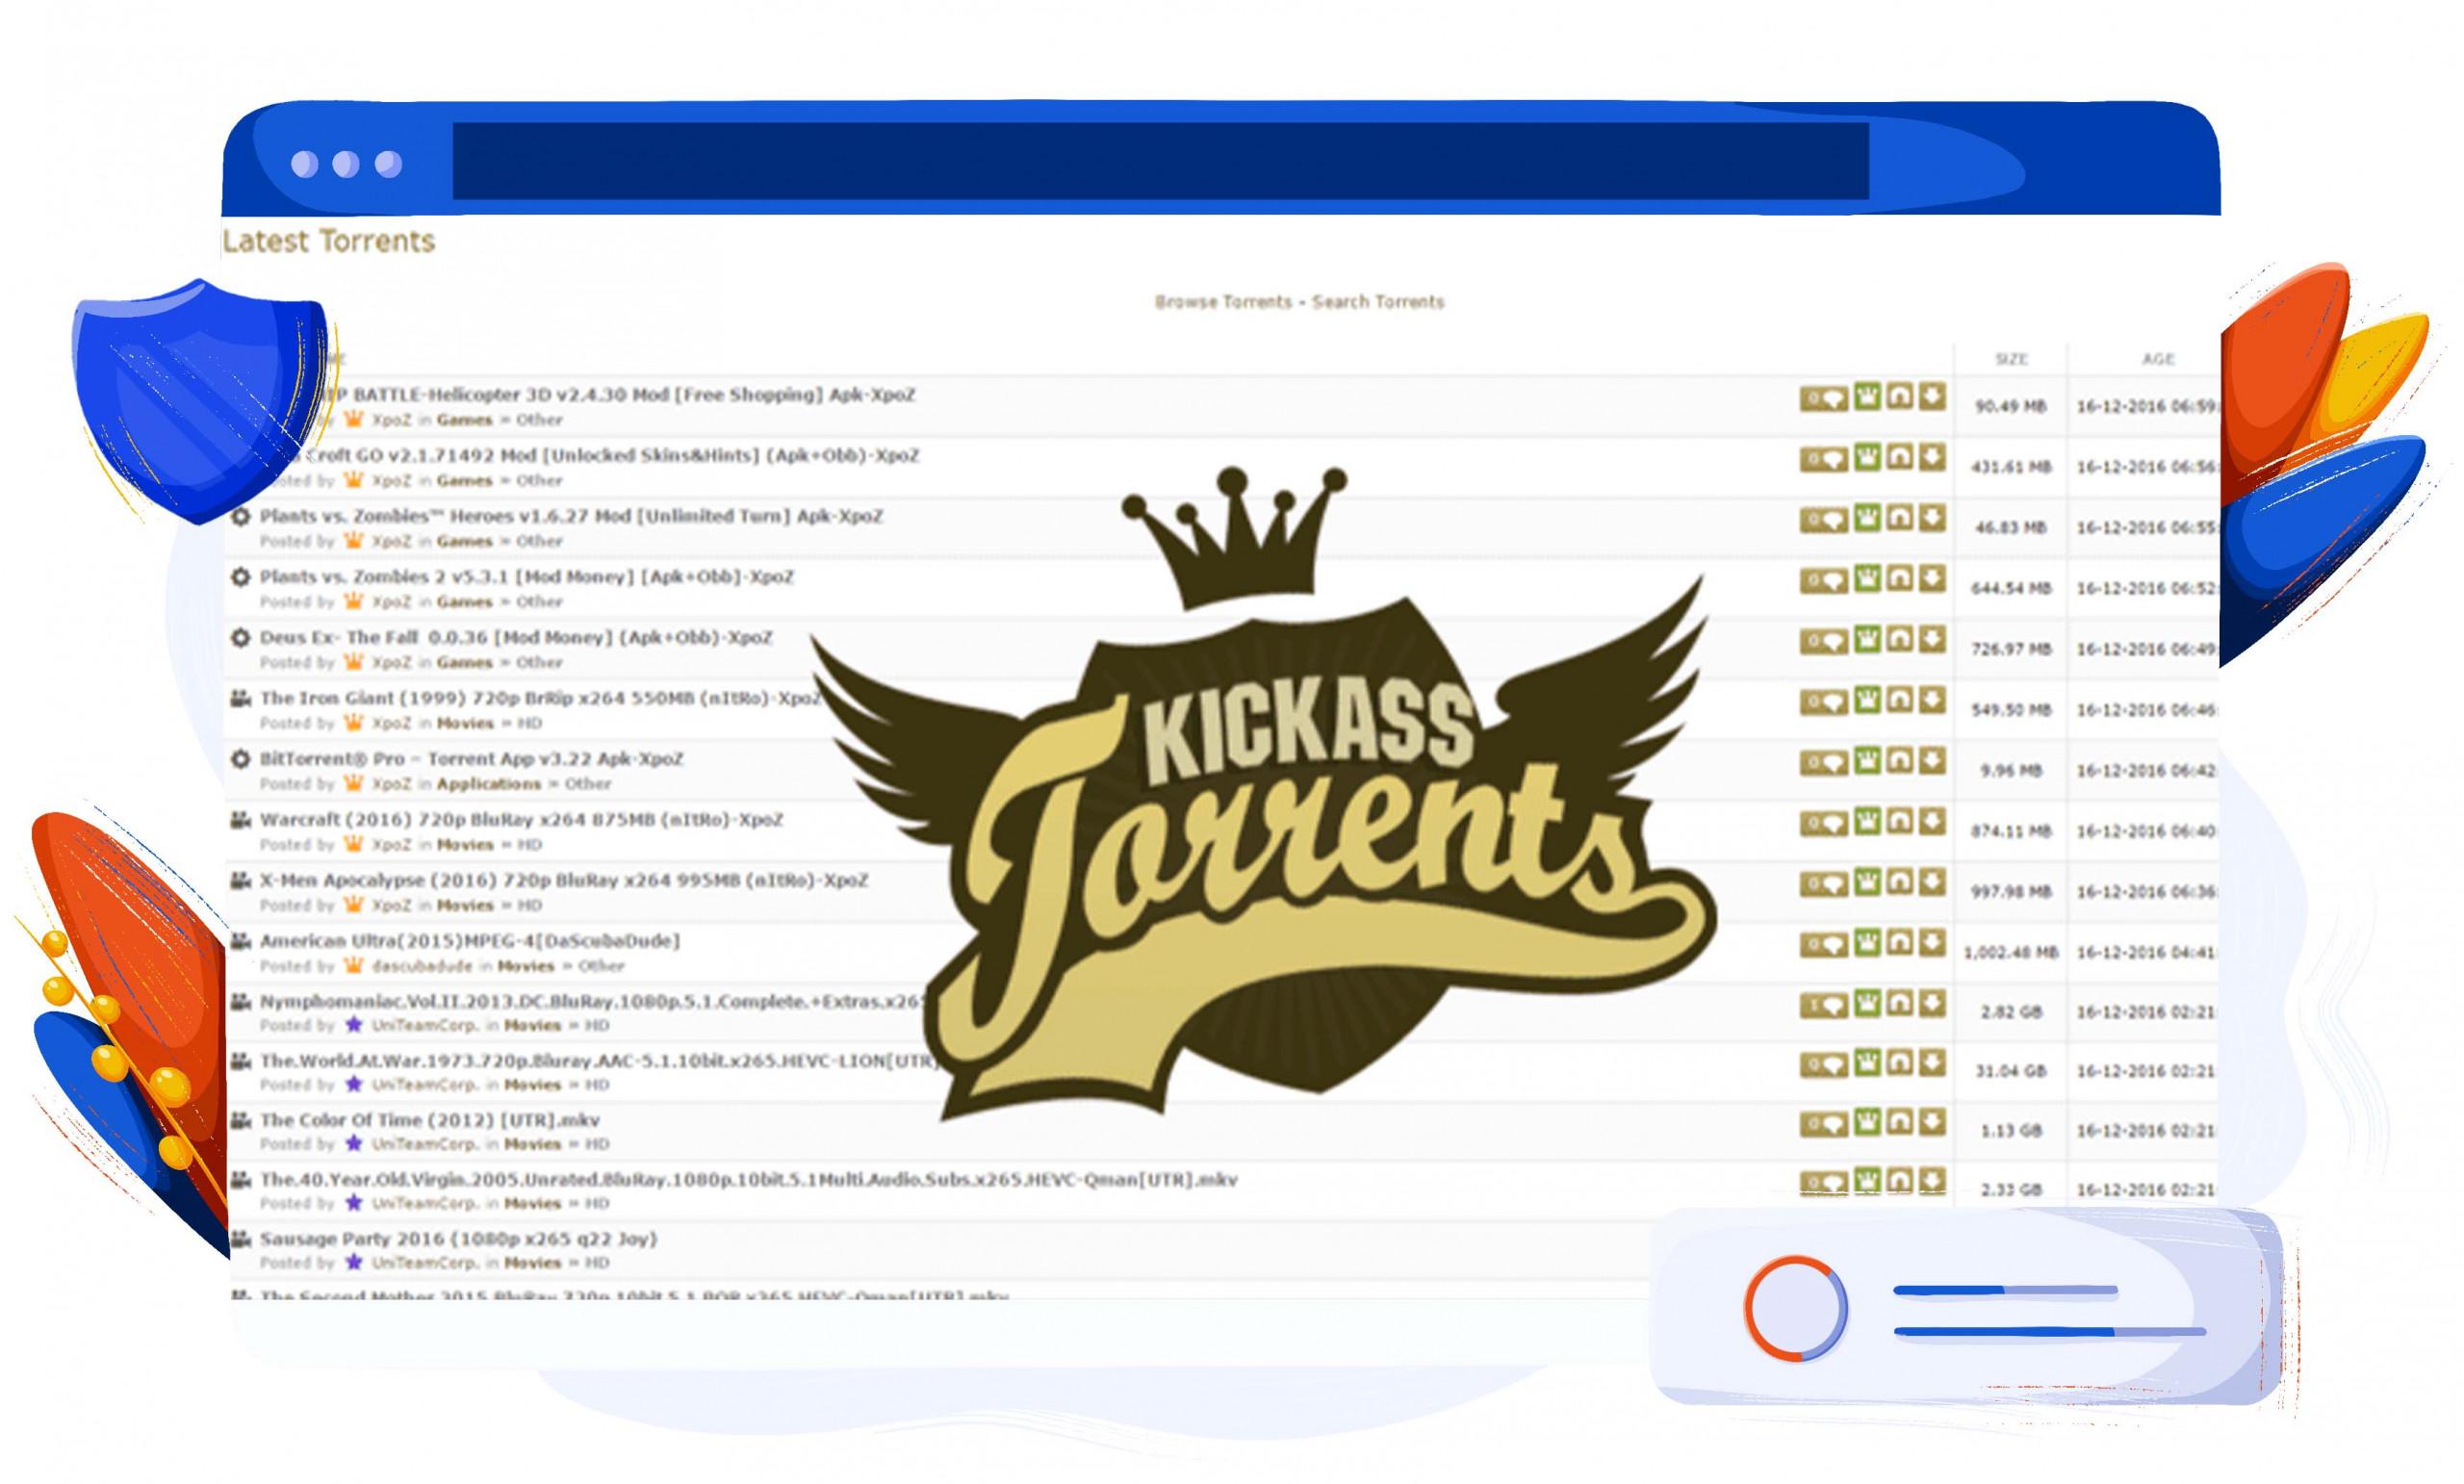 Kickass Torrents have entertainment files